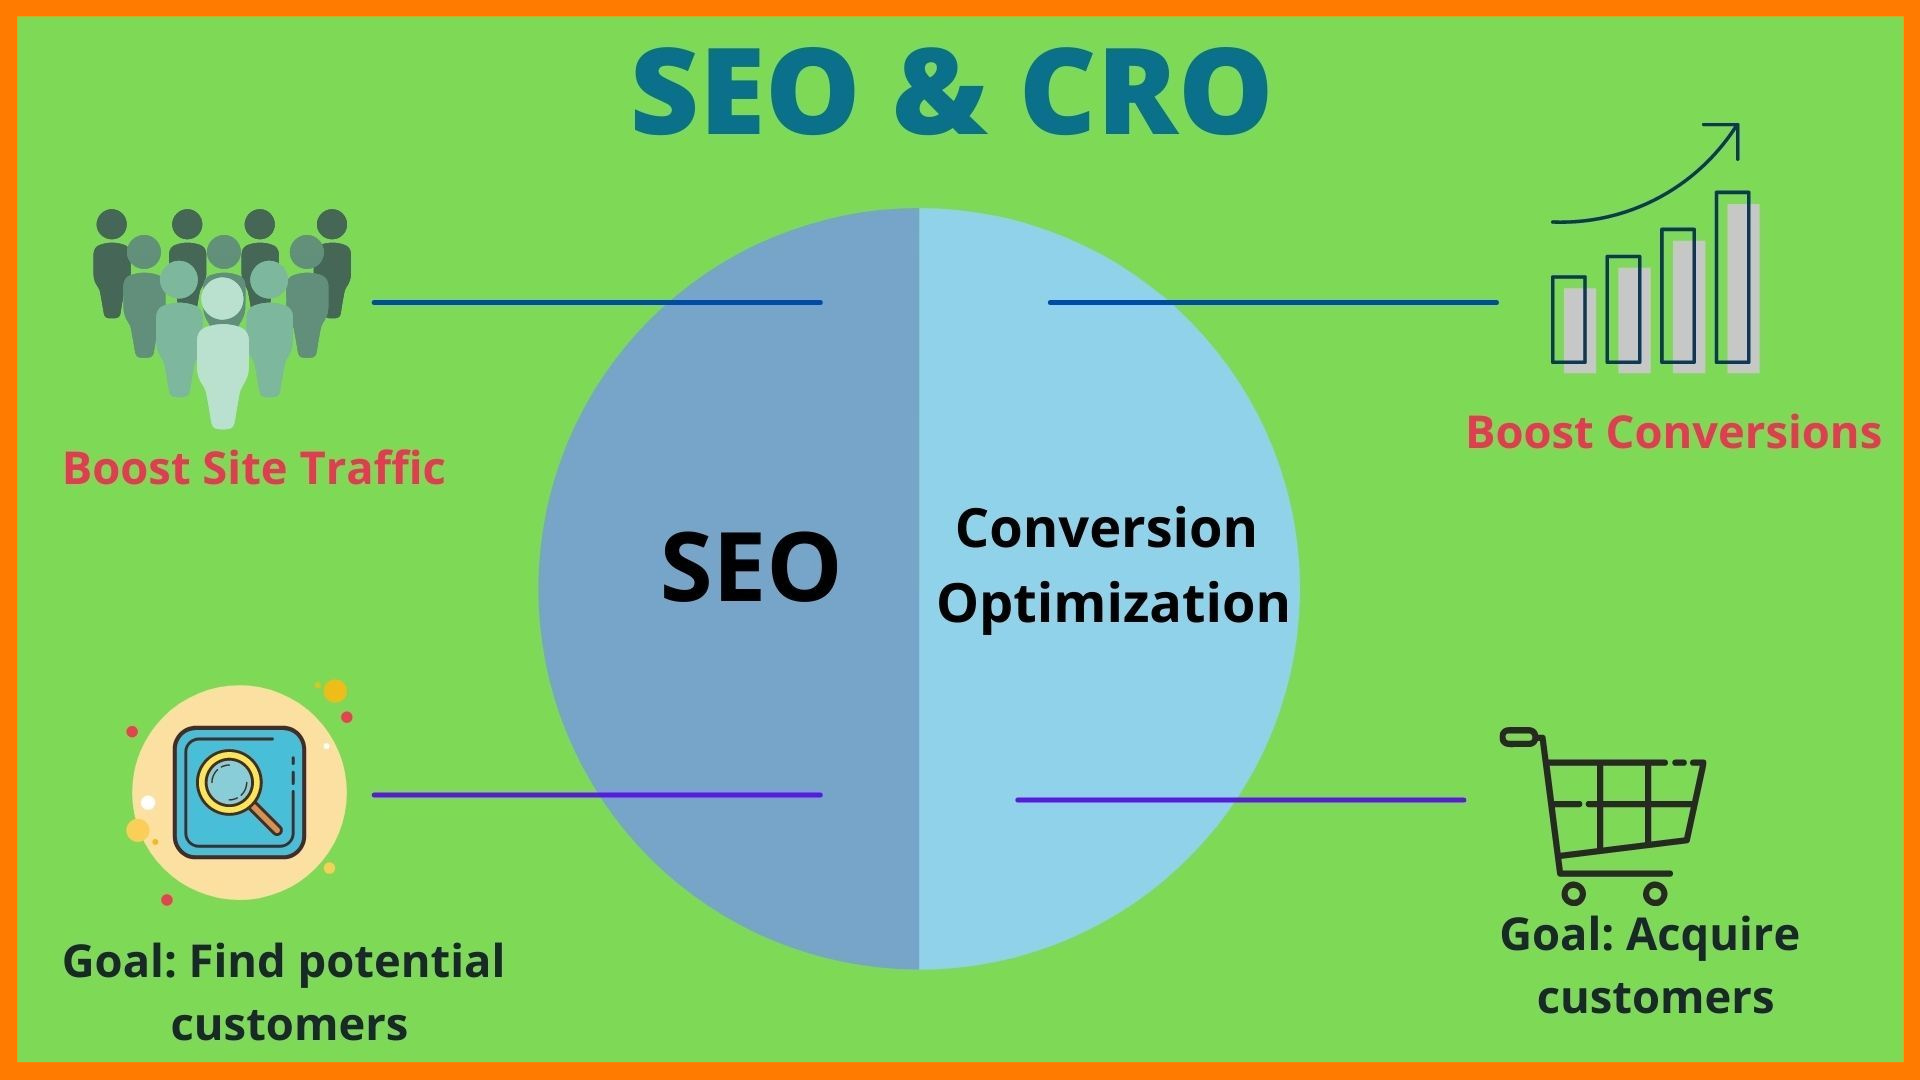 Search Engine Optimization(SEO) & Conversion Rate Optimization(CRO)